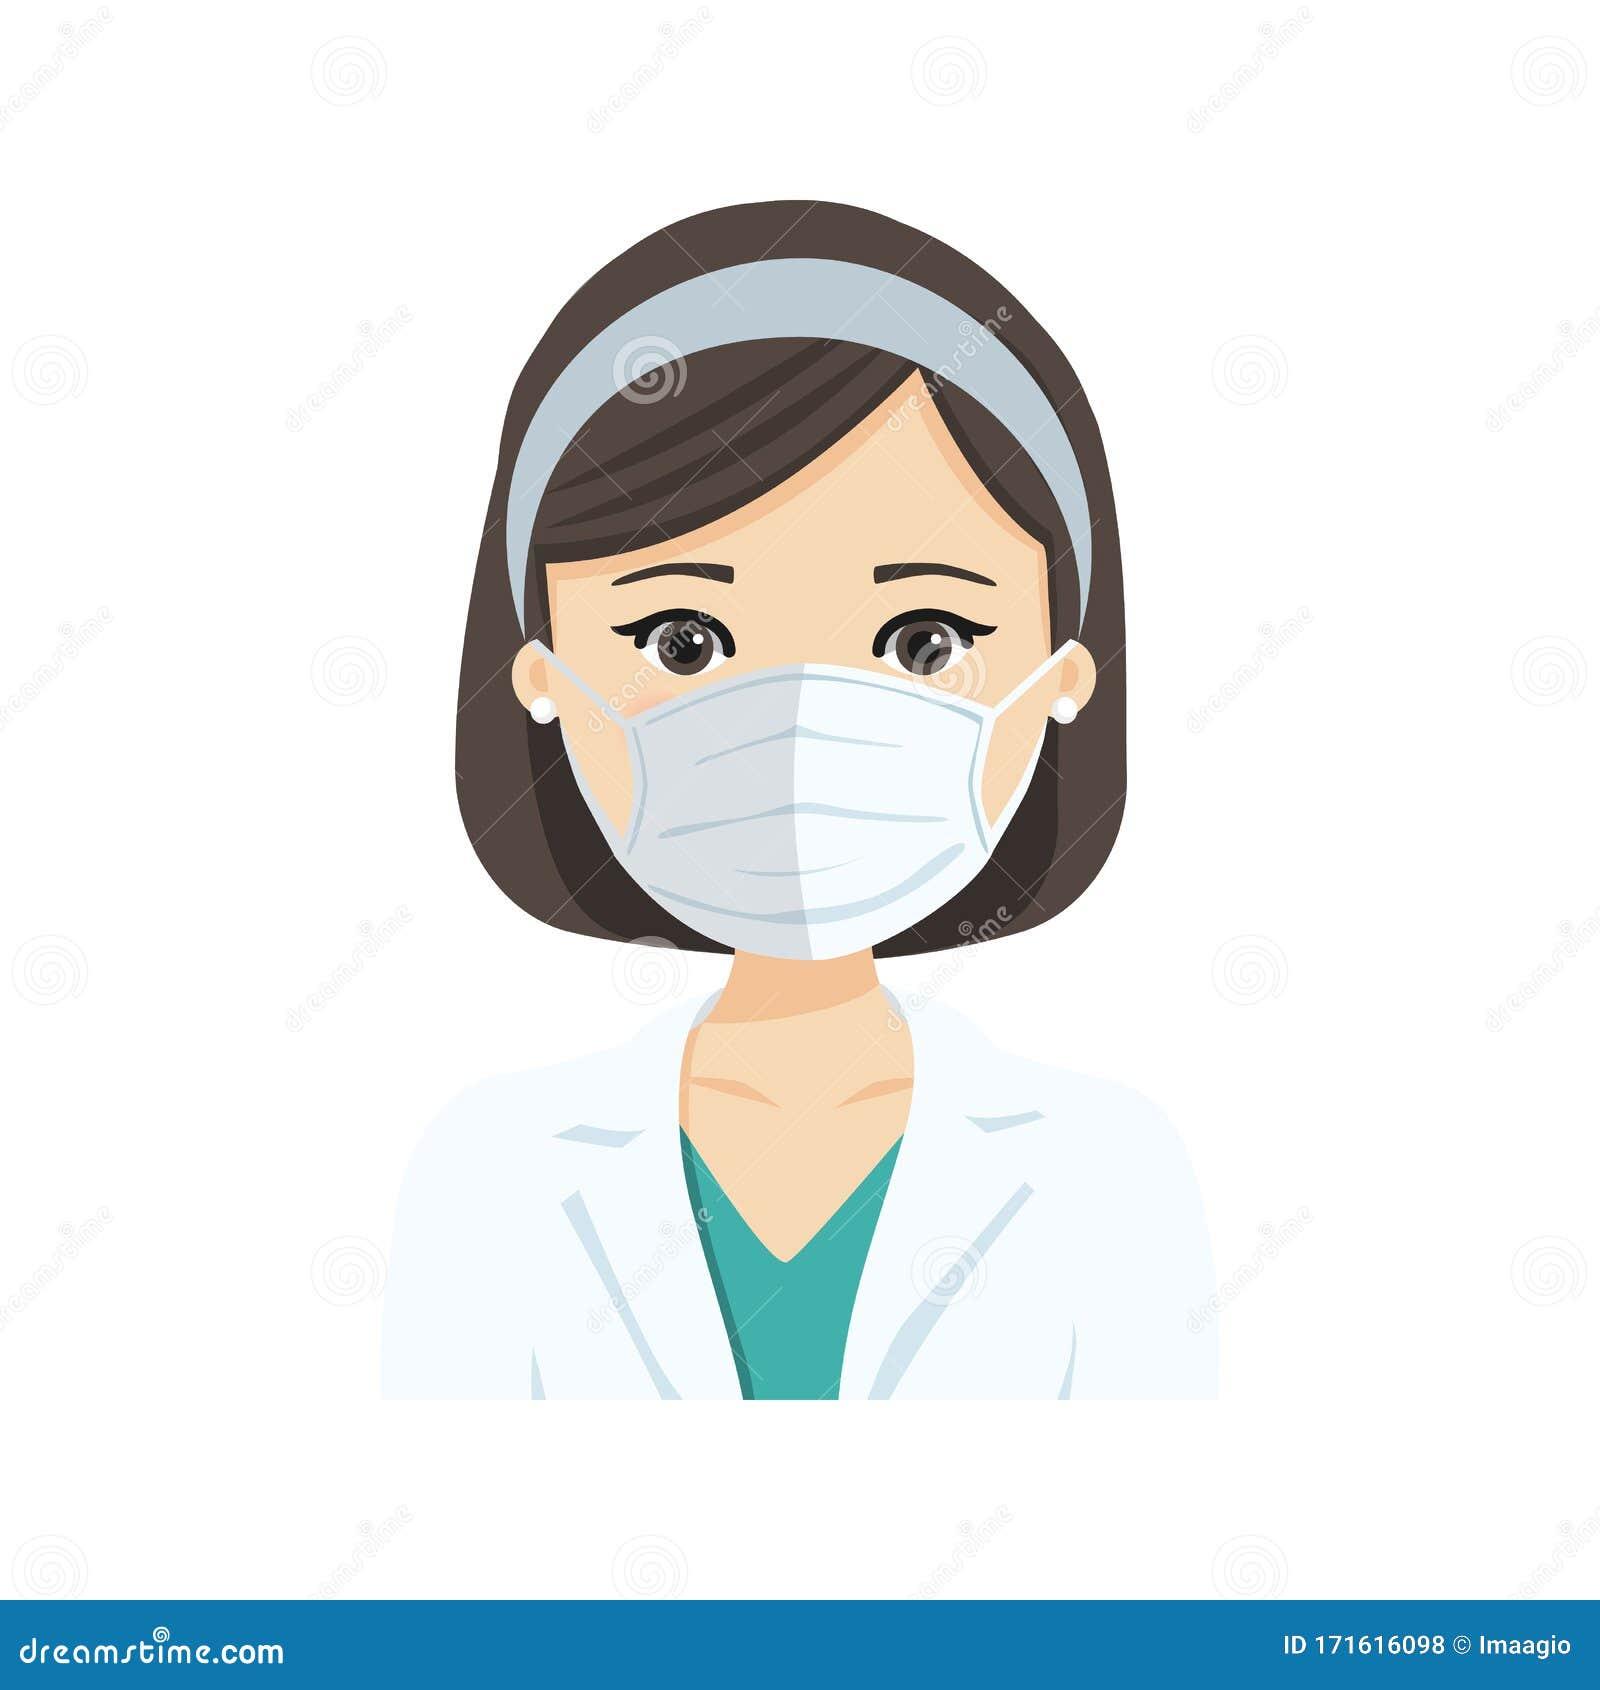 doctor n95 mask